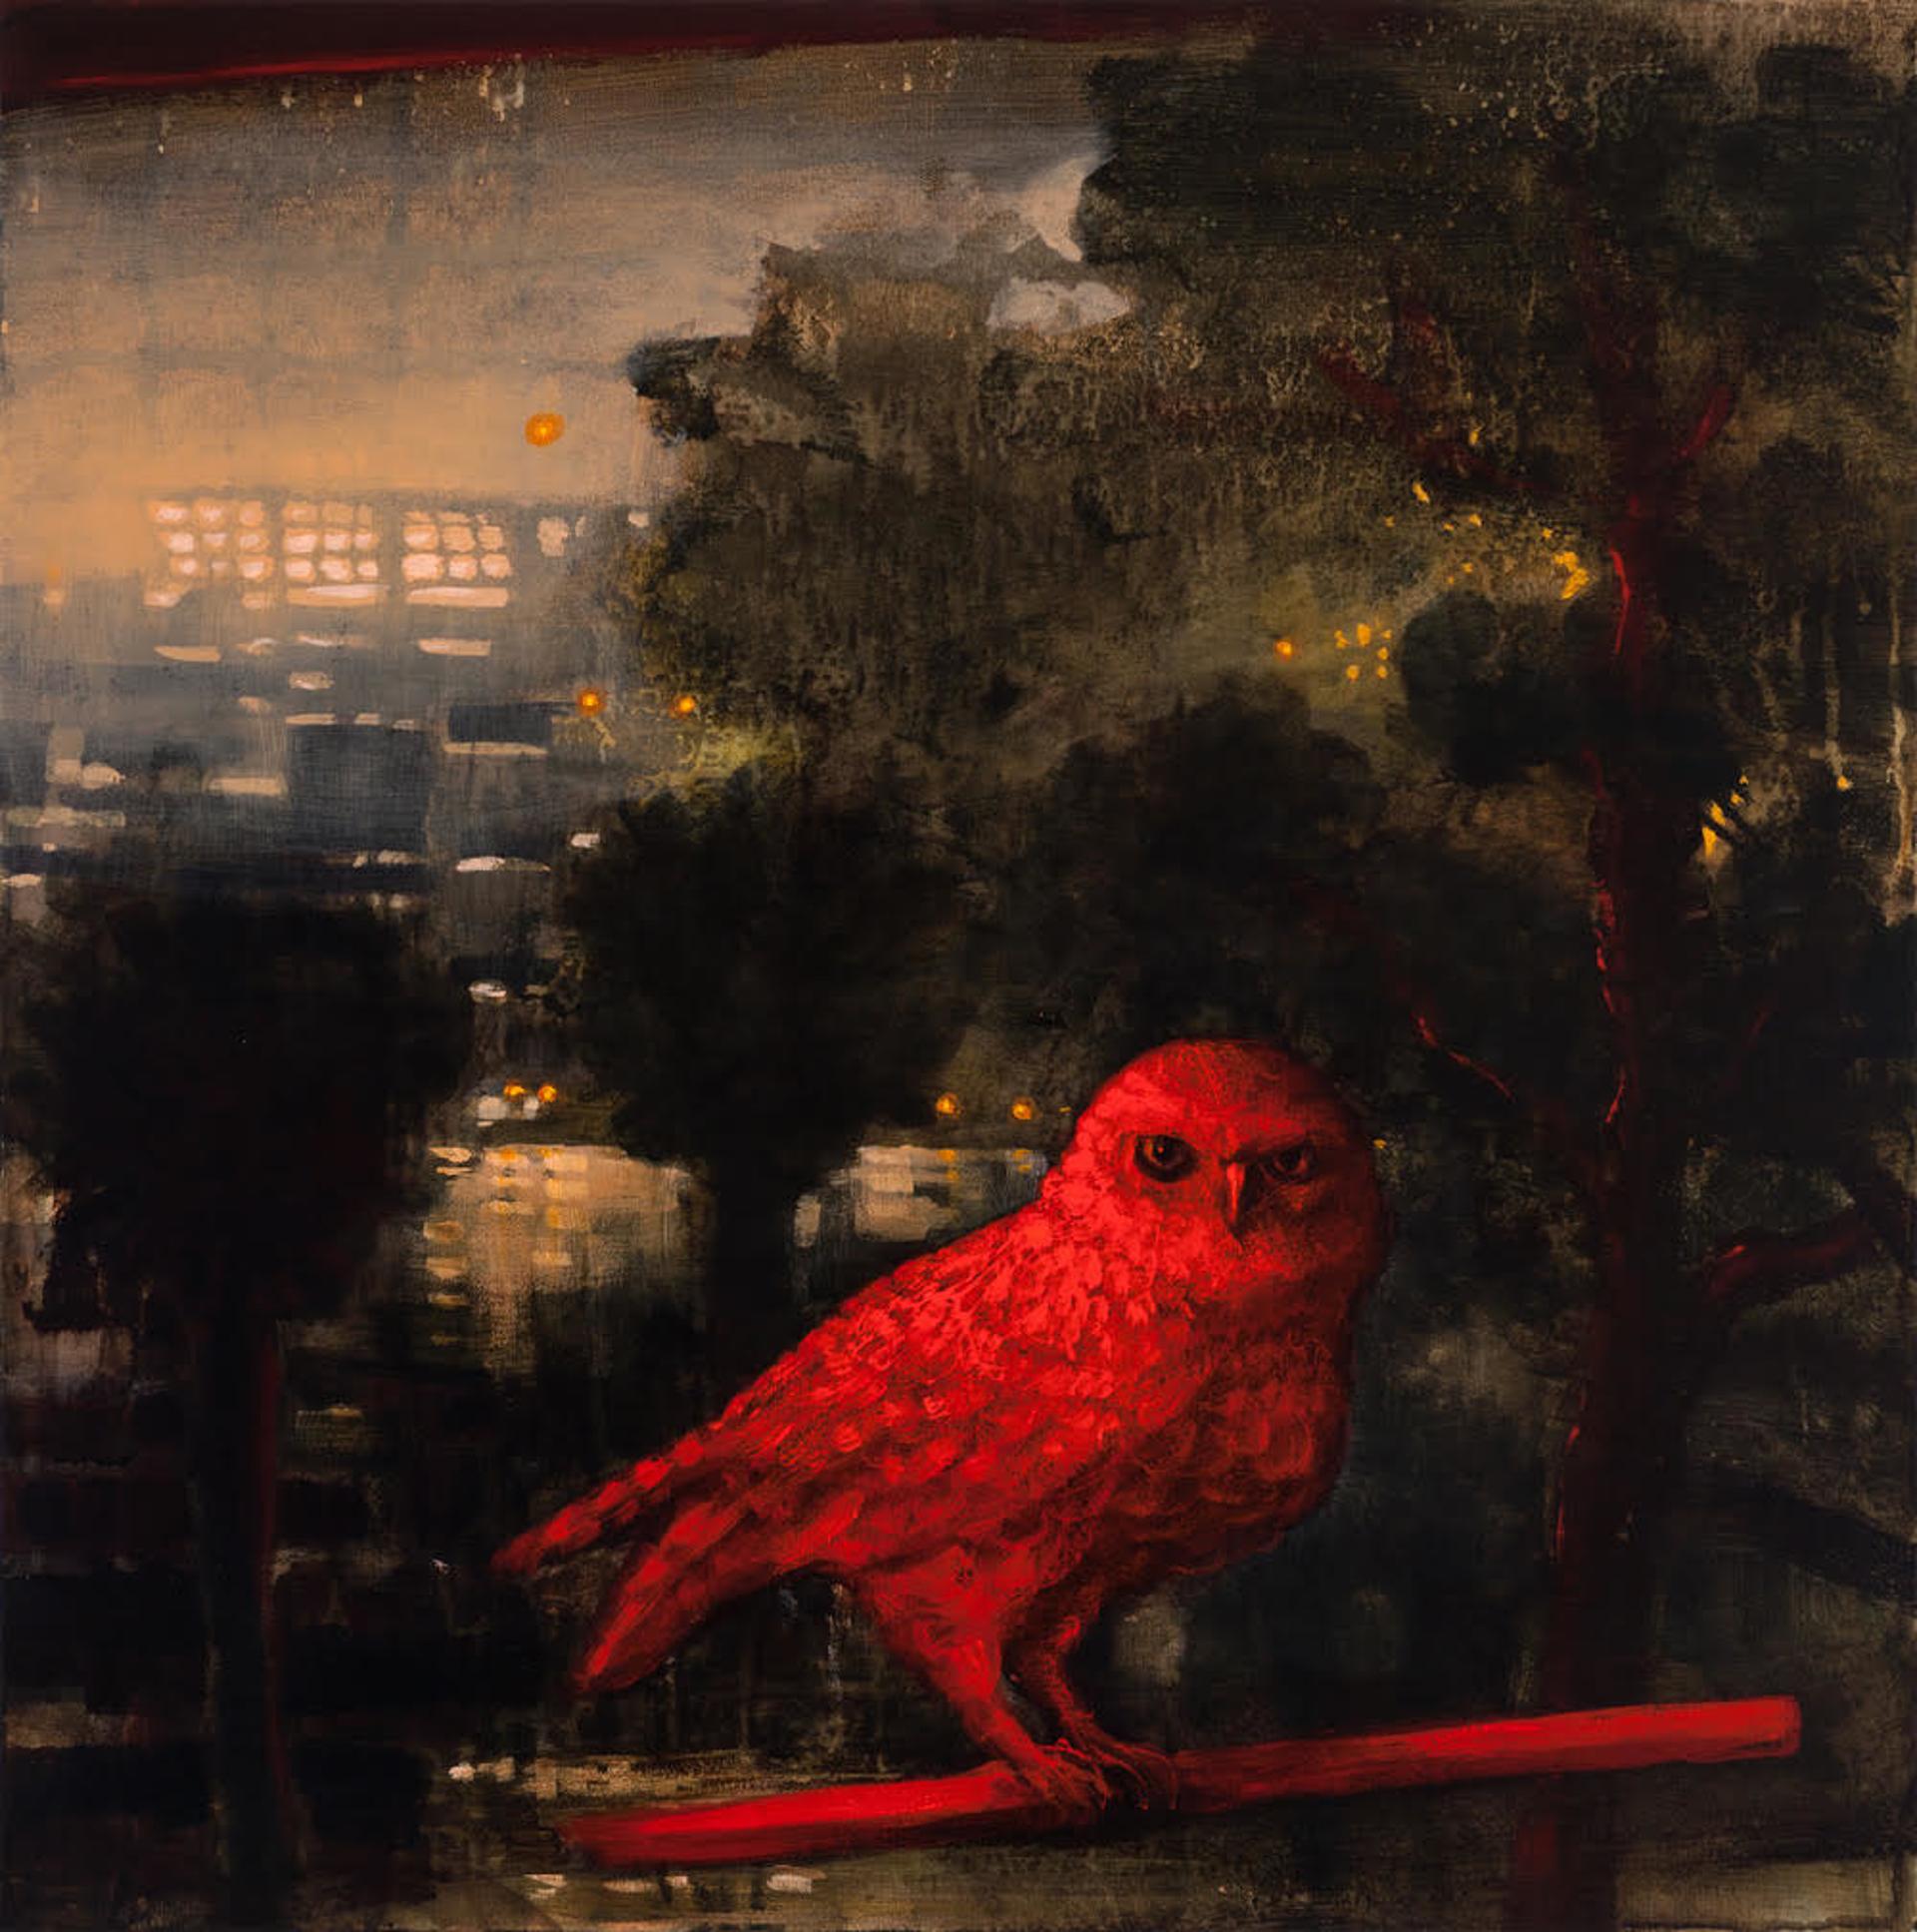 The Hidden Bird by Kevin Sloan